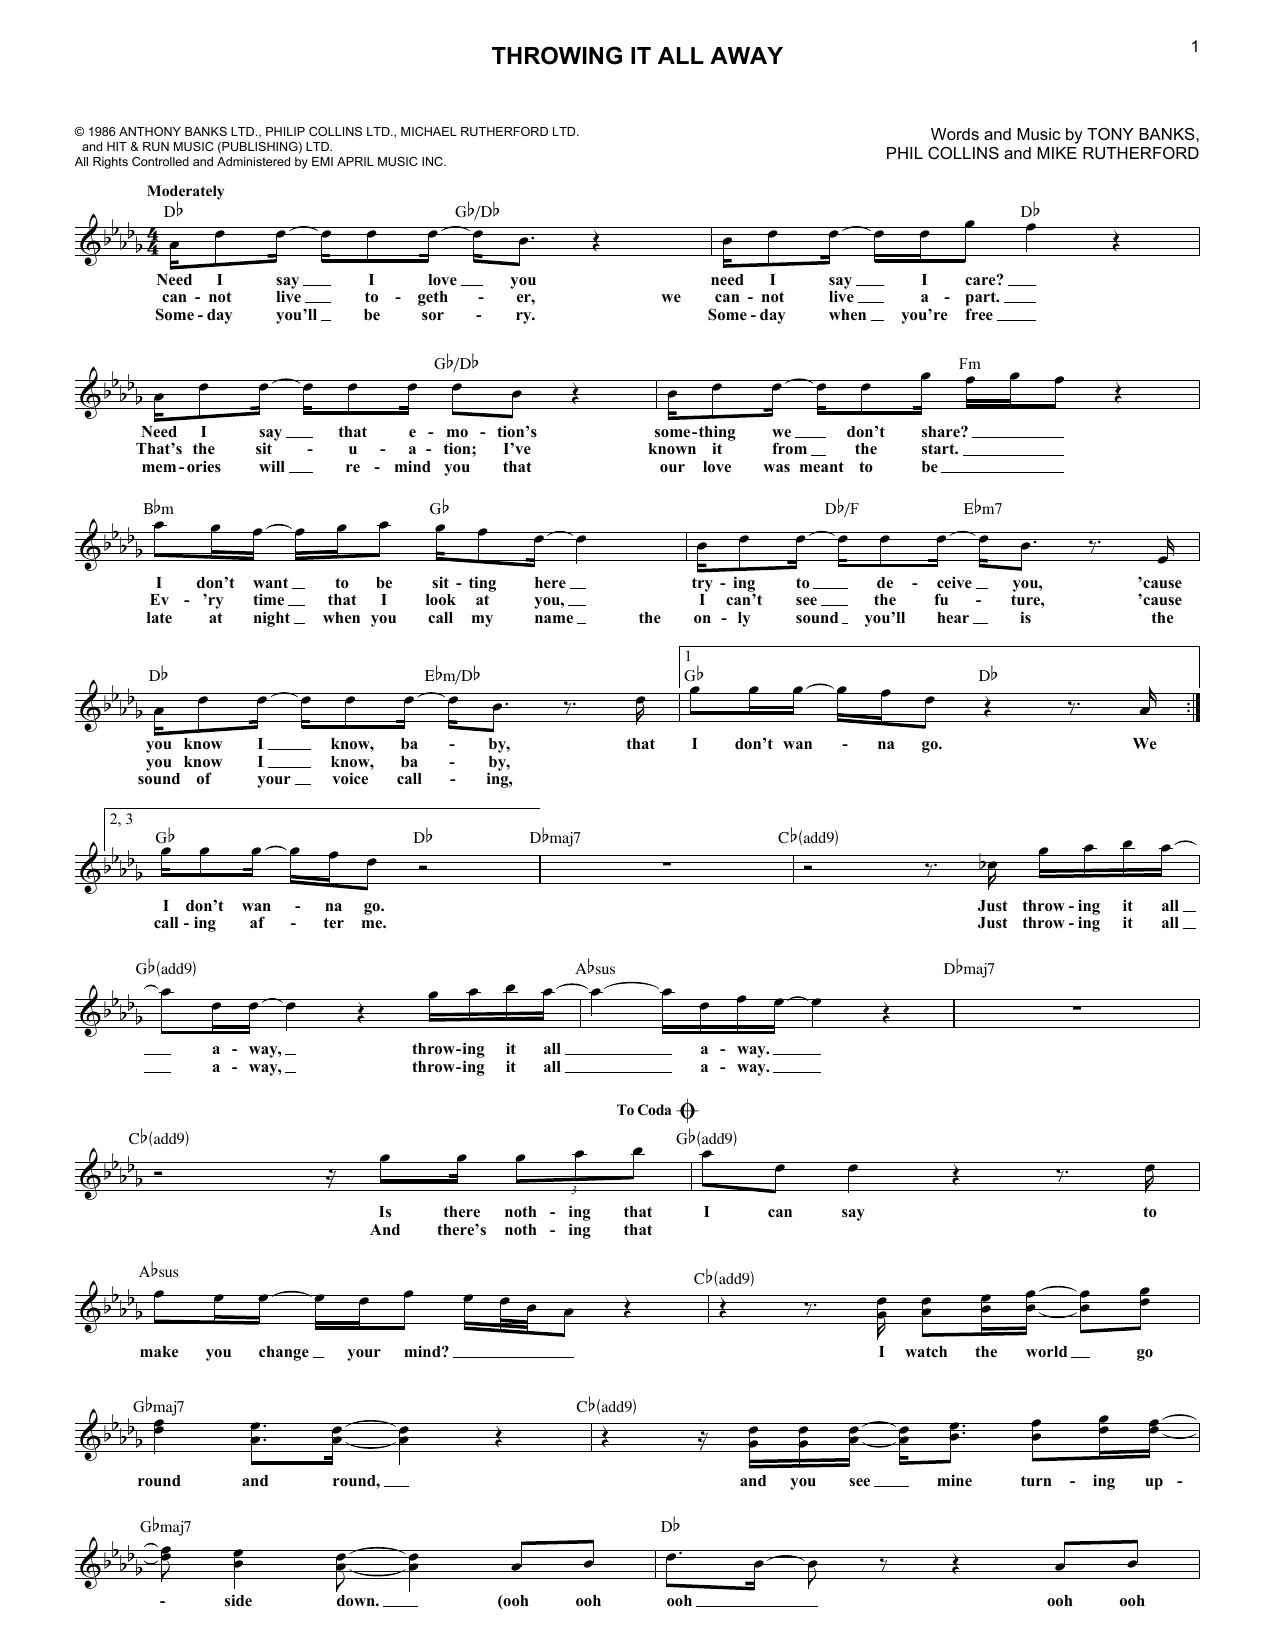 Sheet Music Digital by Merriam Music.